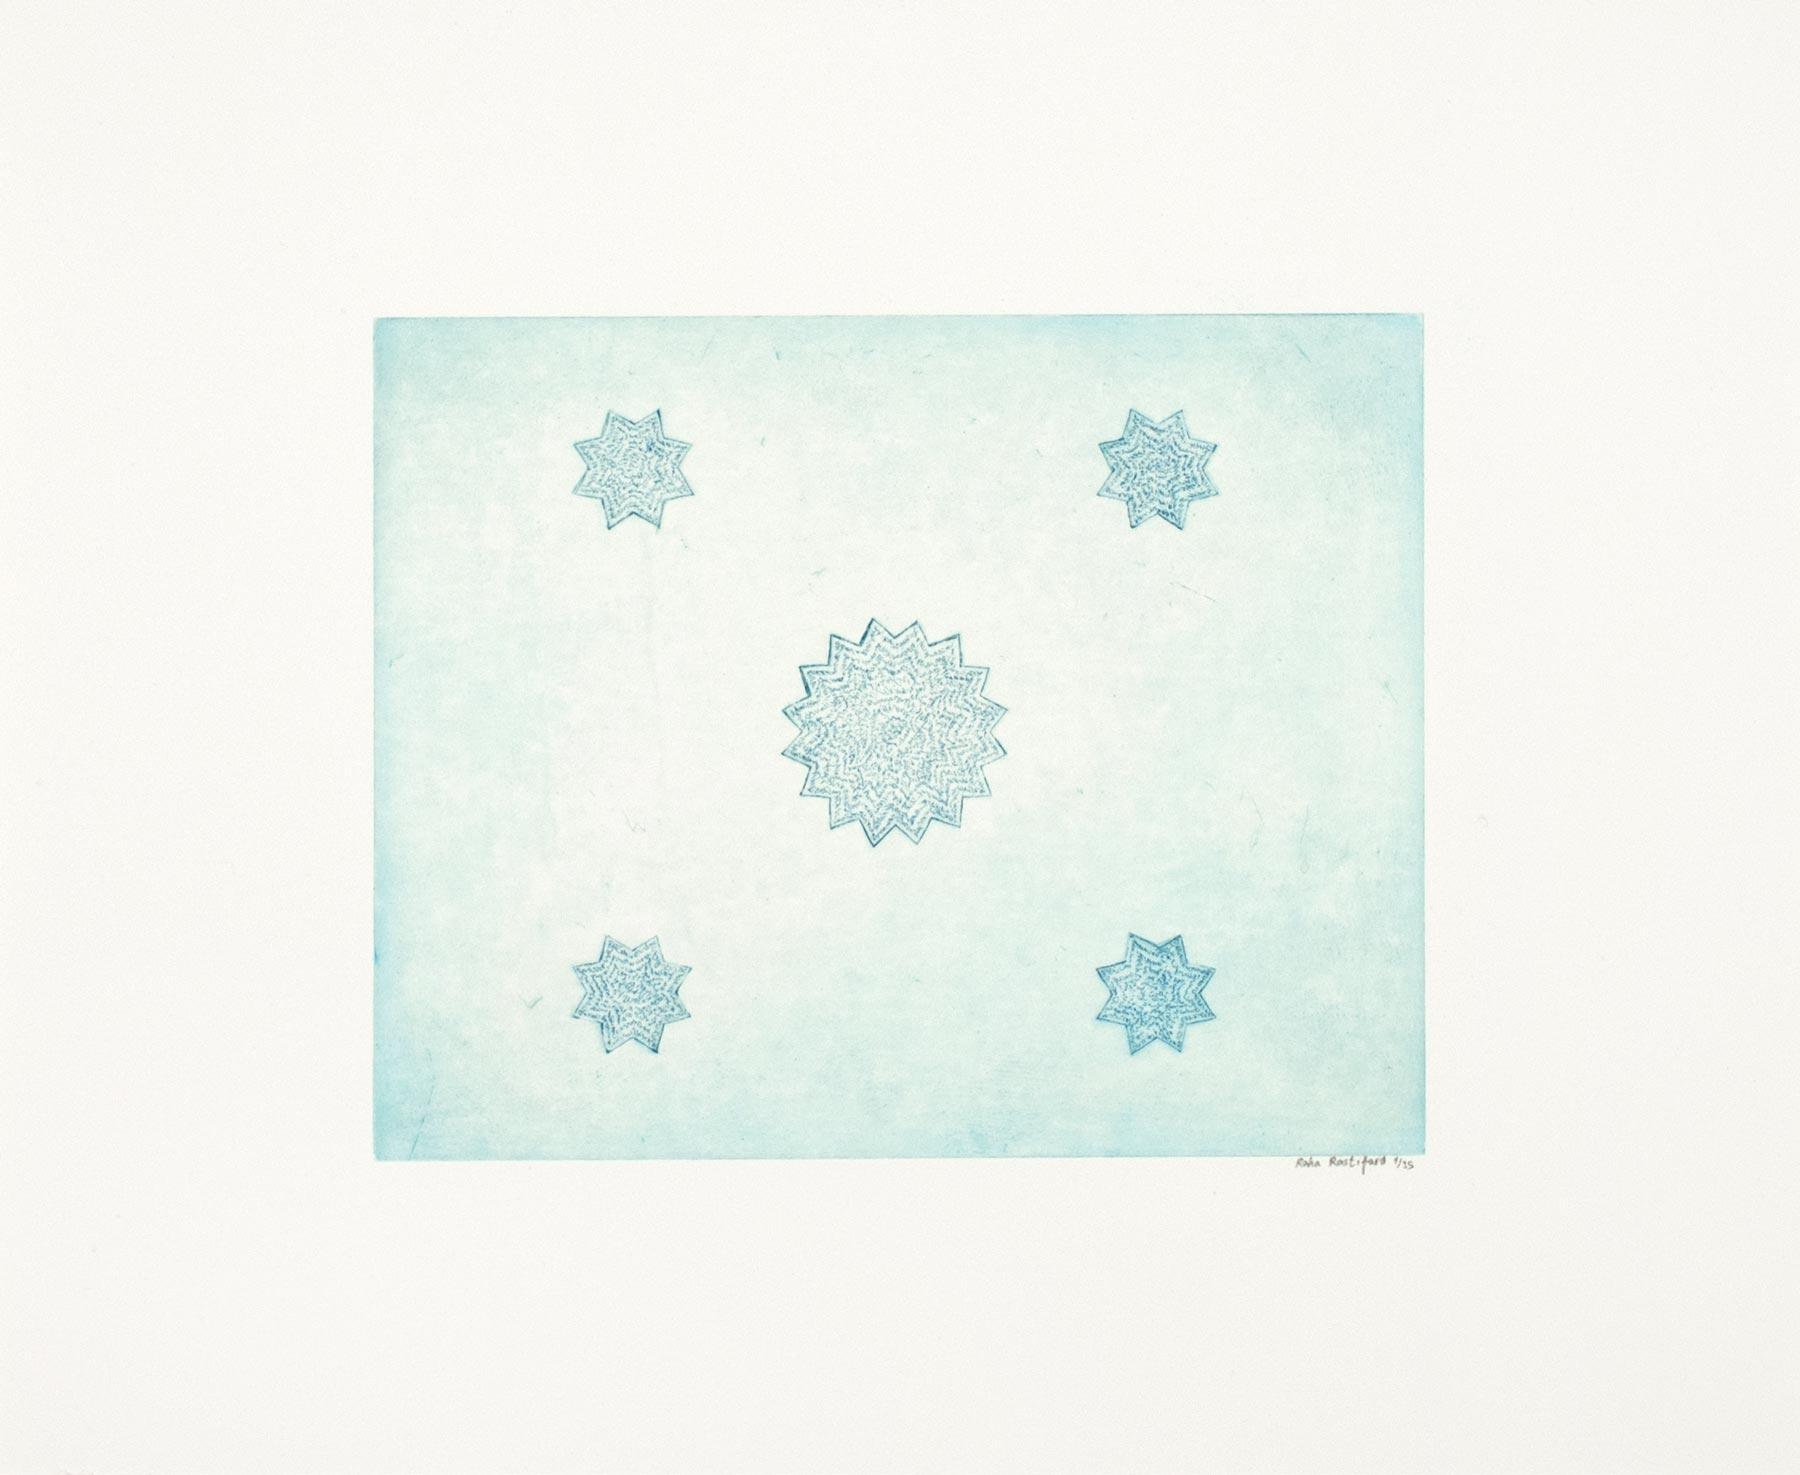 untitled-rastifard-blue.jpg